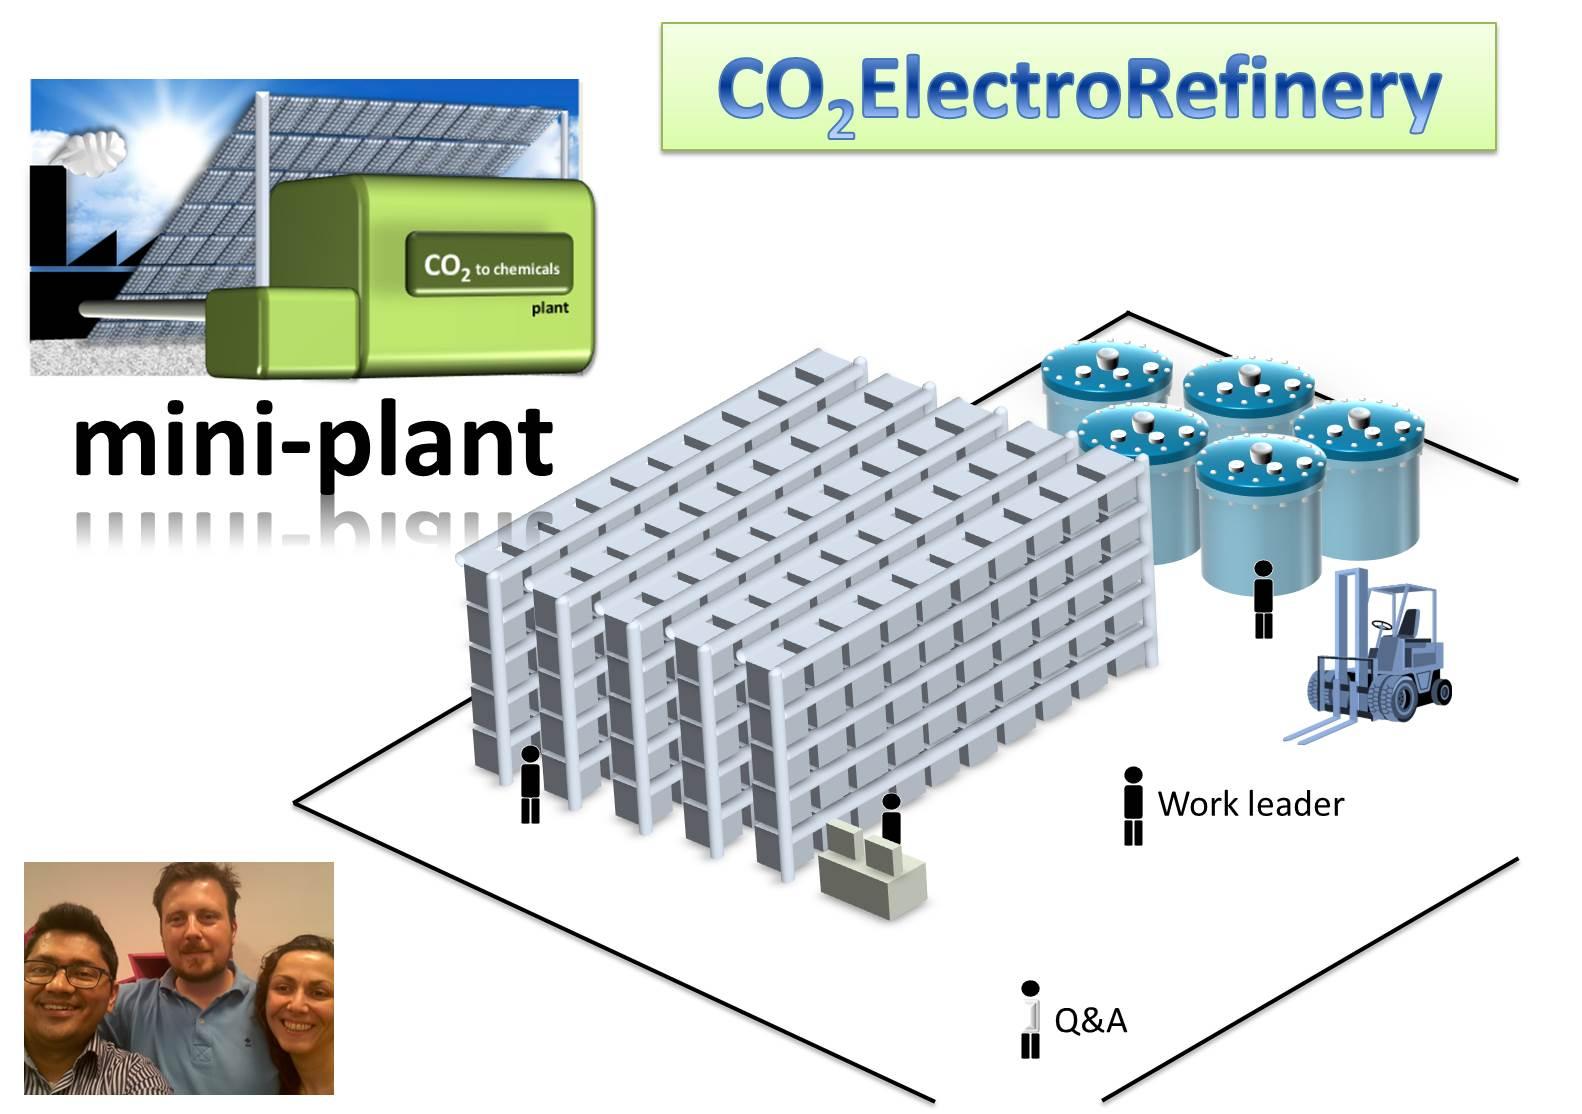 CO2ElectroRefinery